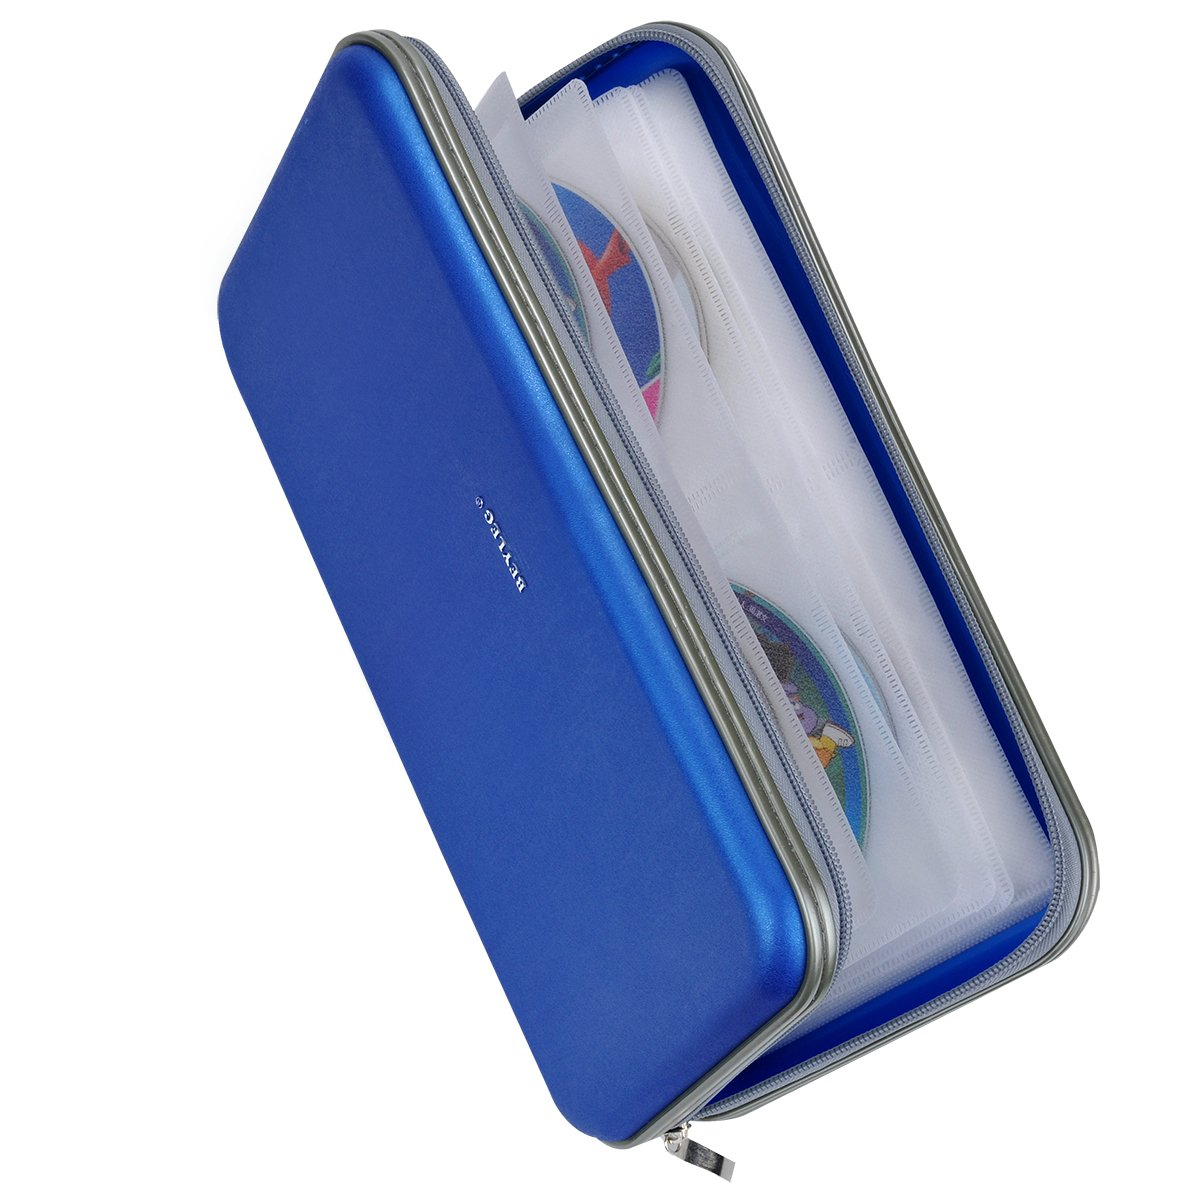 Wismart 72 Capacity Heavy Duty CD DVD Blu-ray Media Case Storage Holder Organizer Wallet (Blue)